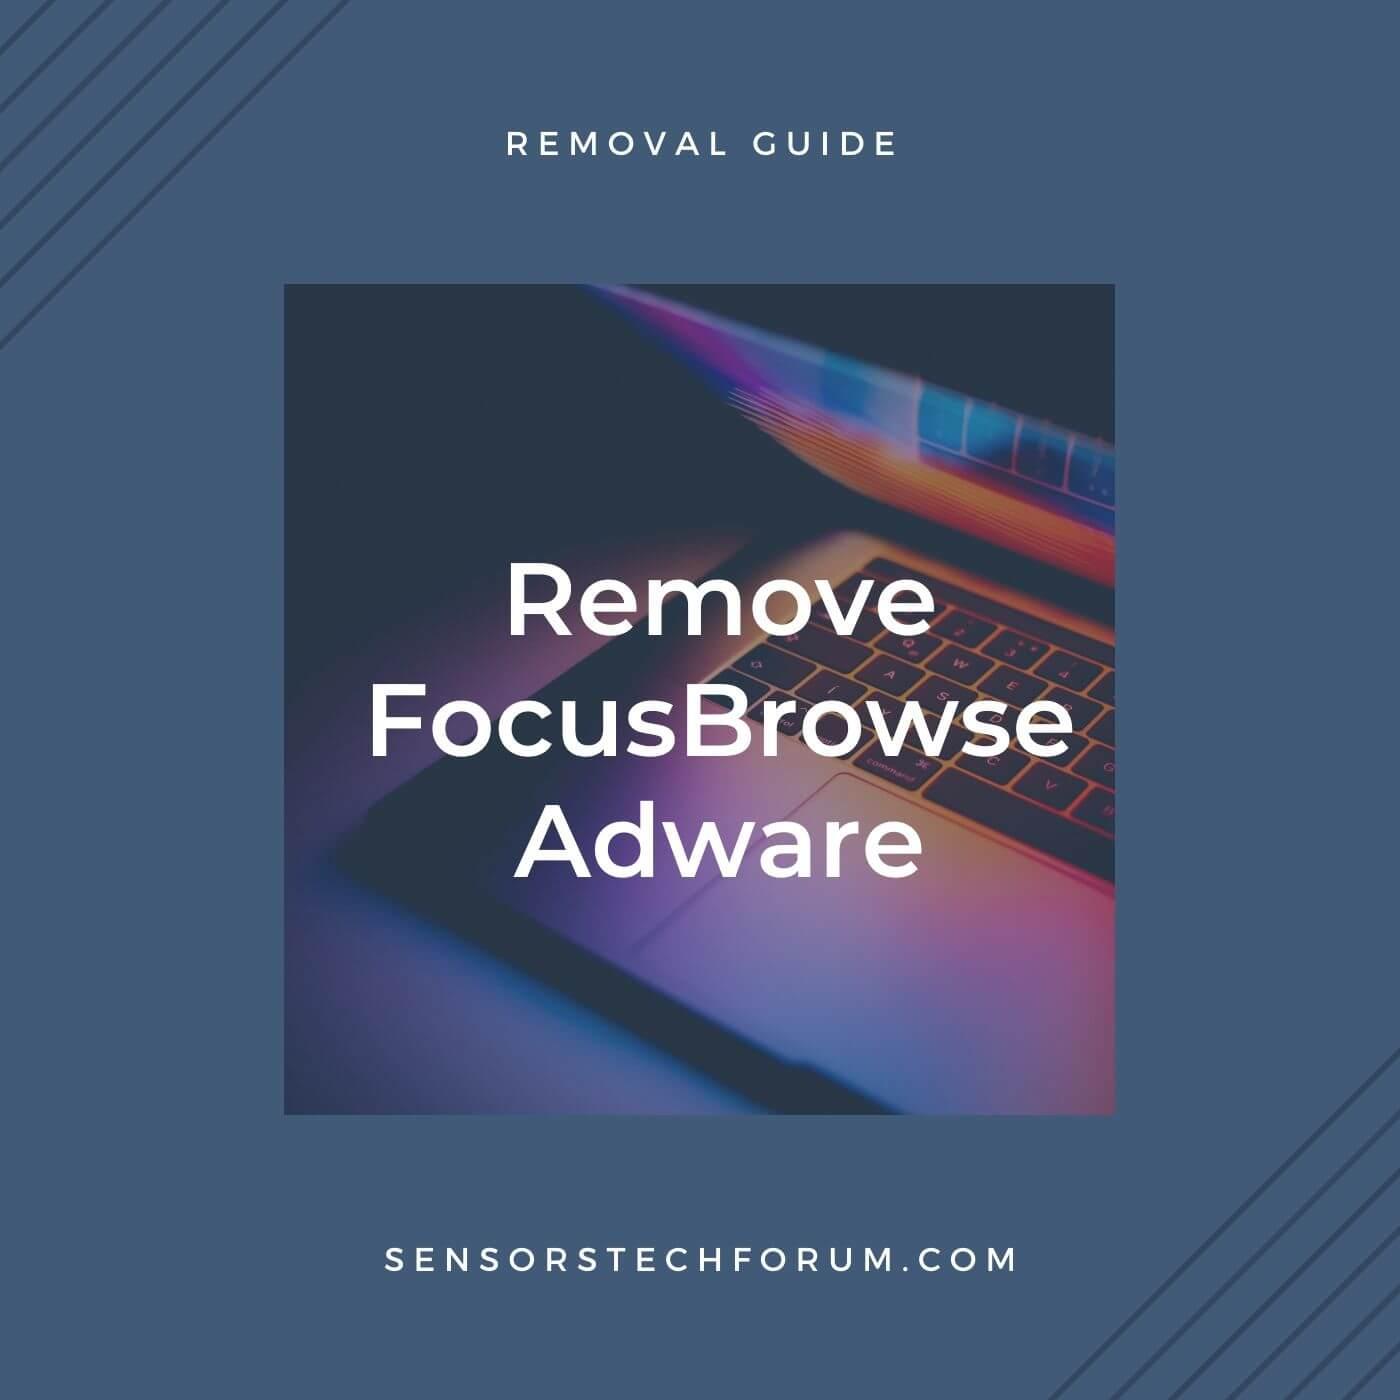 Remove FocusBrowse Adware on Mac